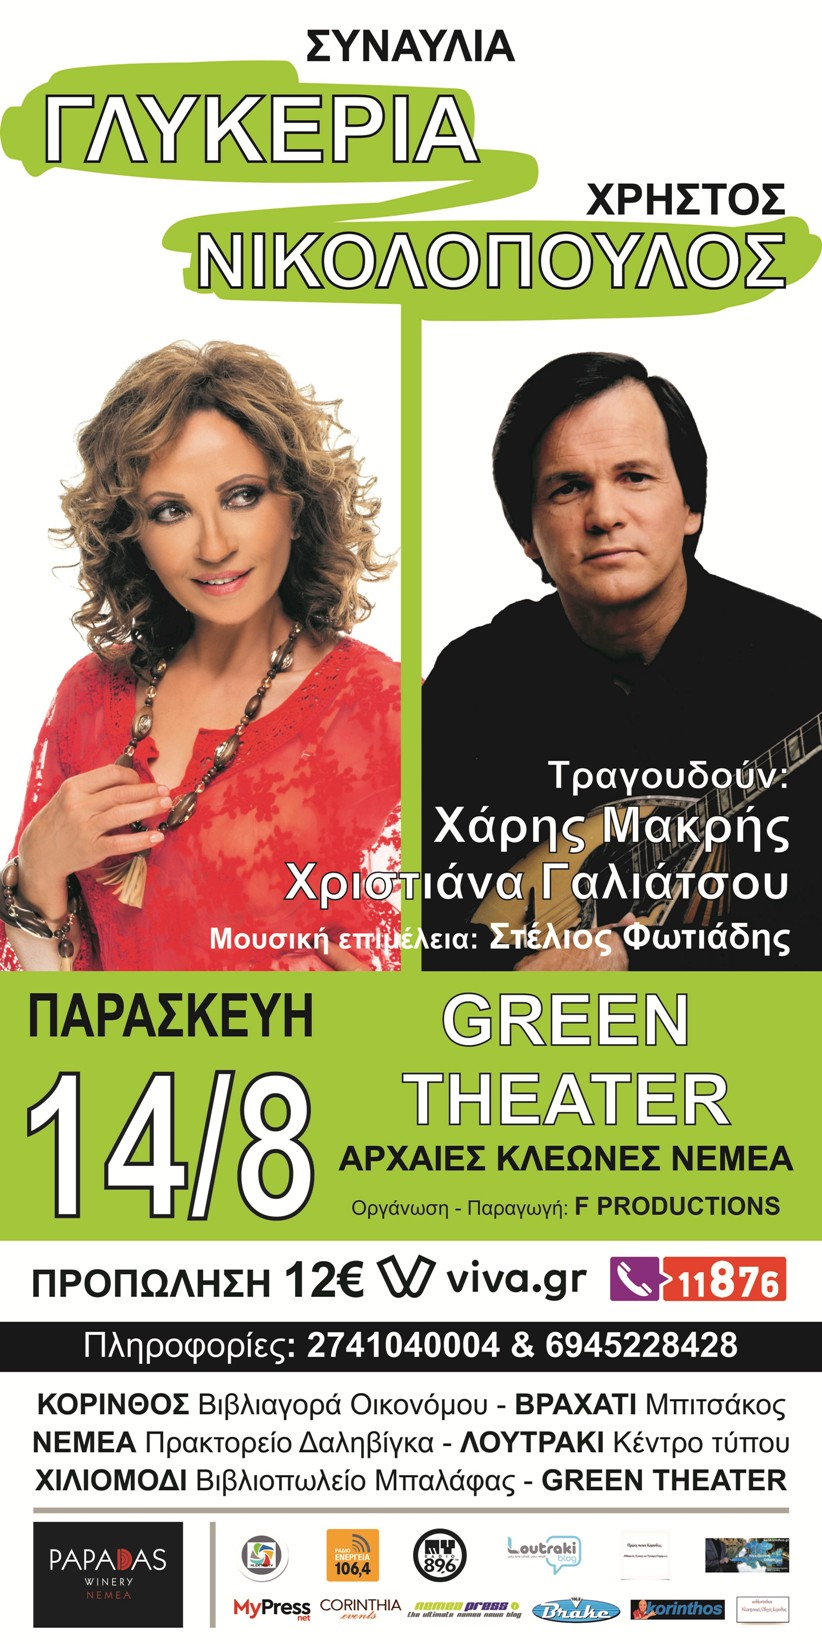 2020_glykeria_nikolopoulos